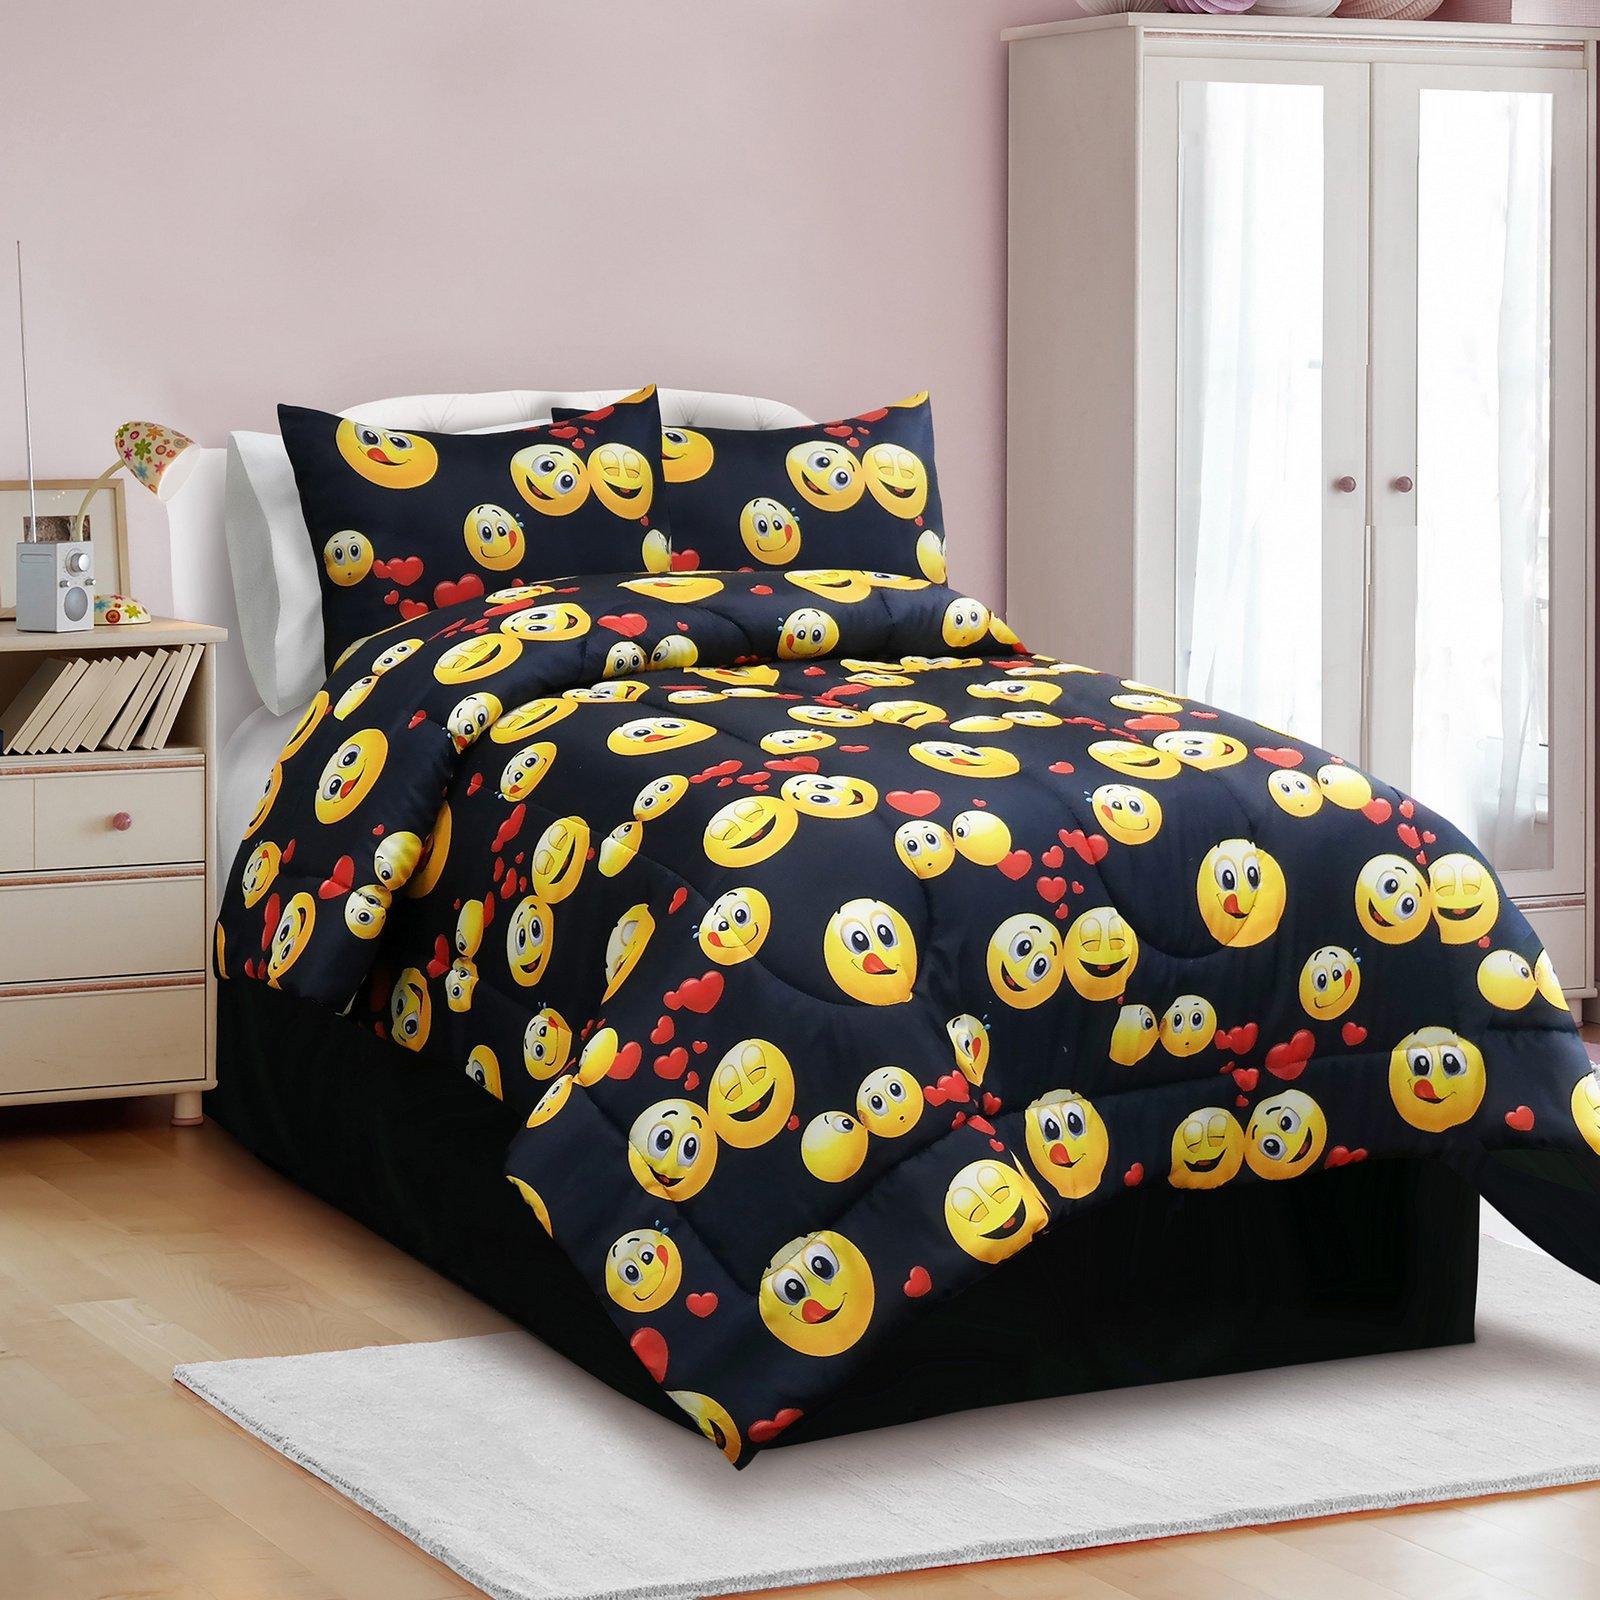 Black Multi Color Comforter Set In Twin Full Or Queen